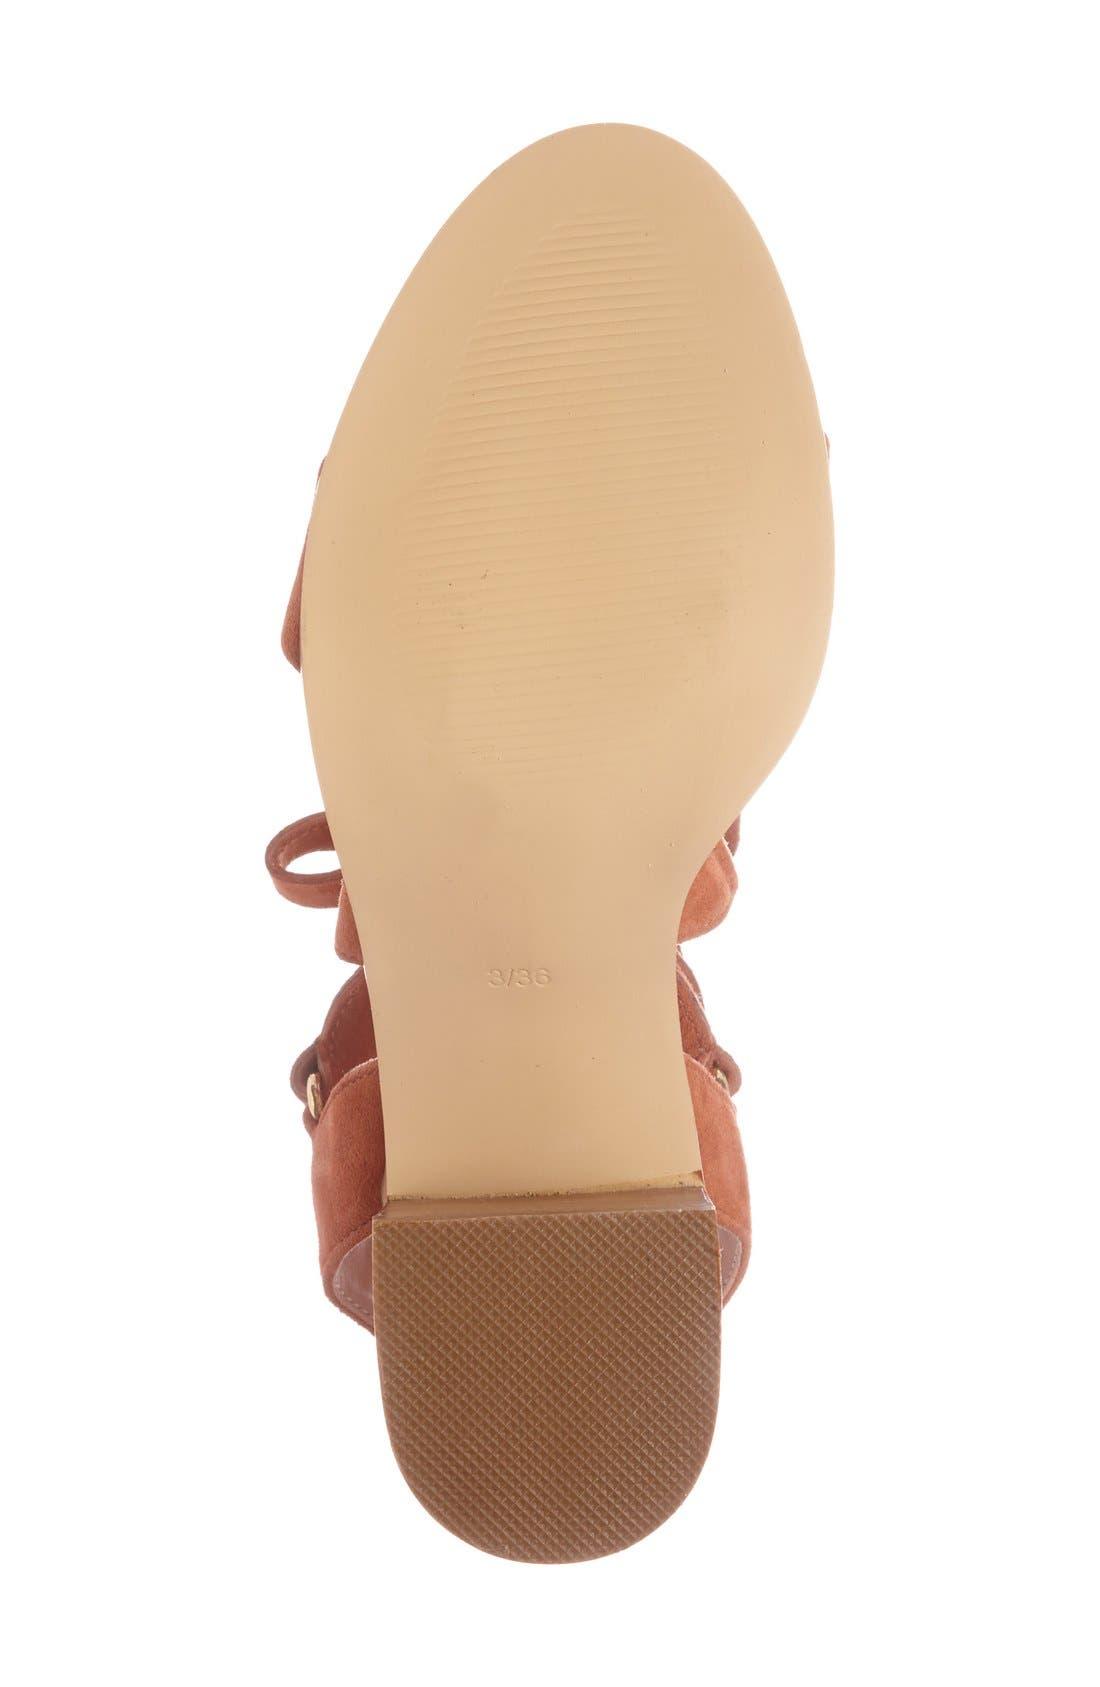 'Nadra' Lace-Up Sandal,                             Alternate thumbnail 4, color,                             Orange Suede